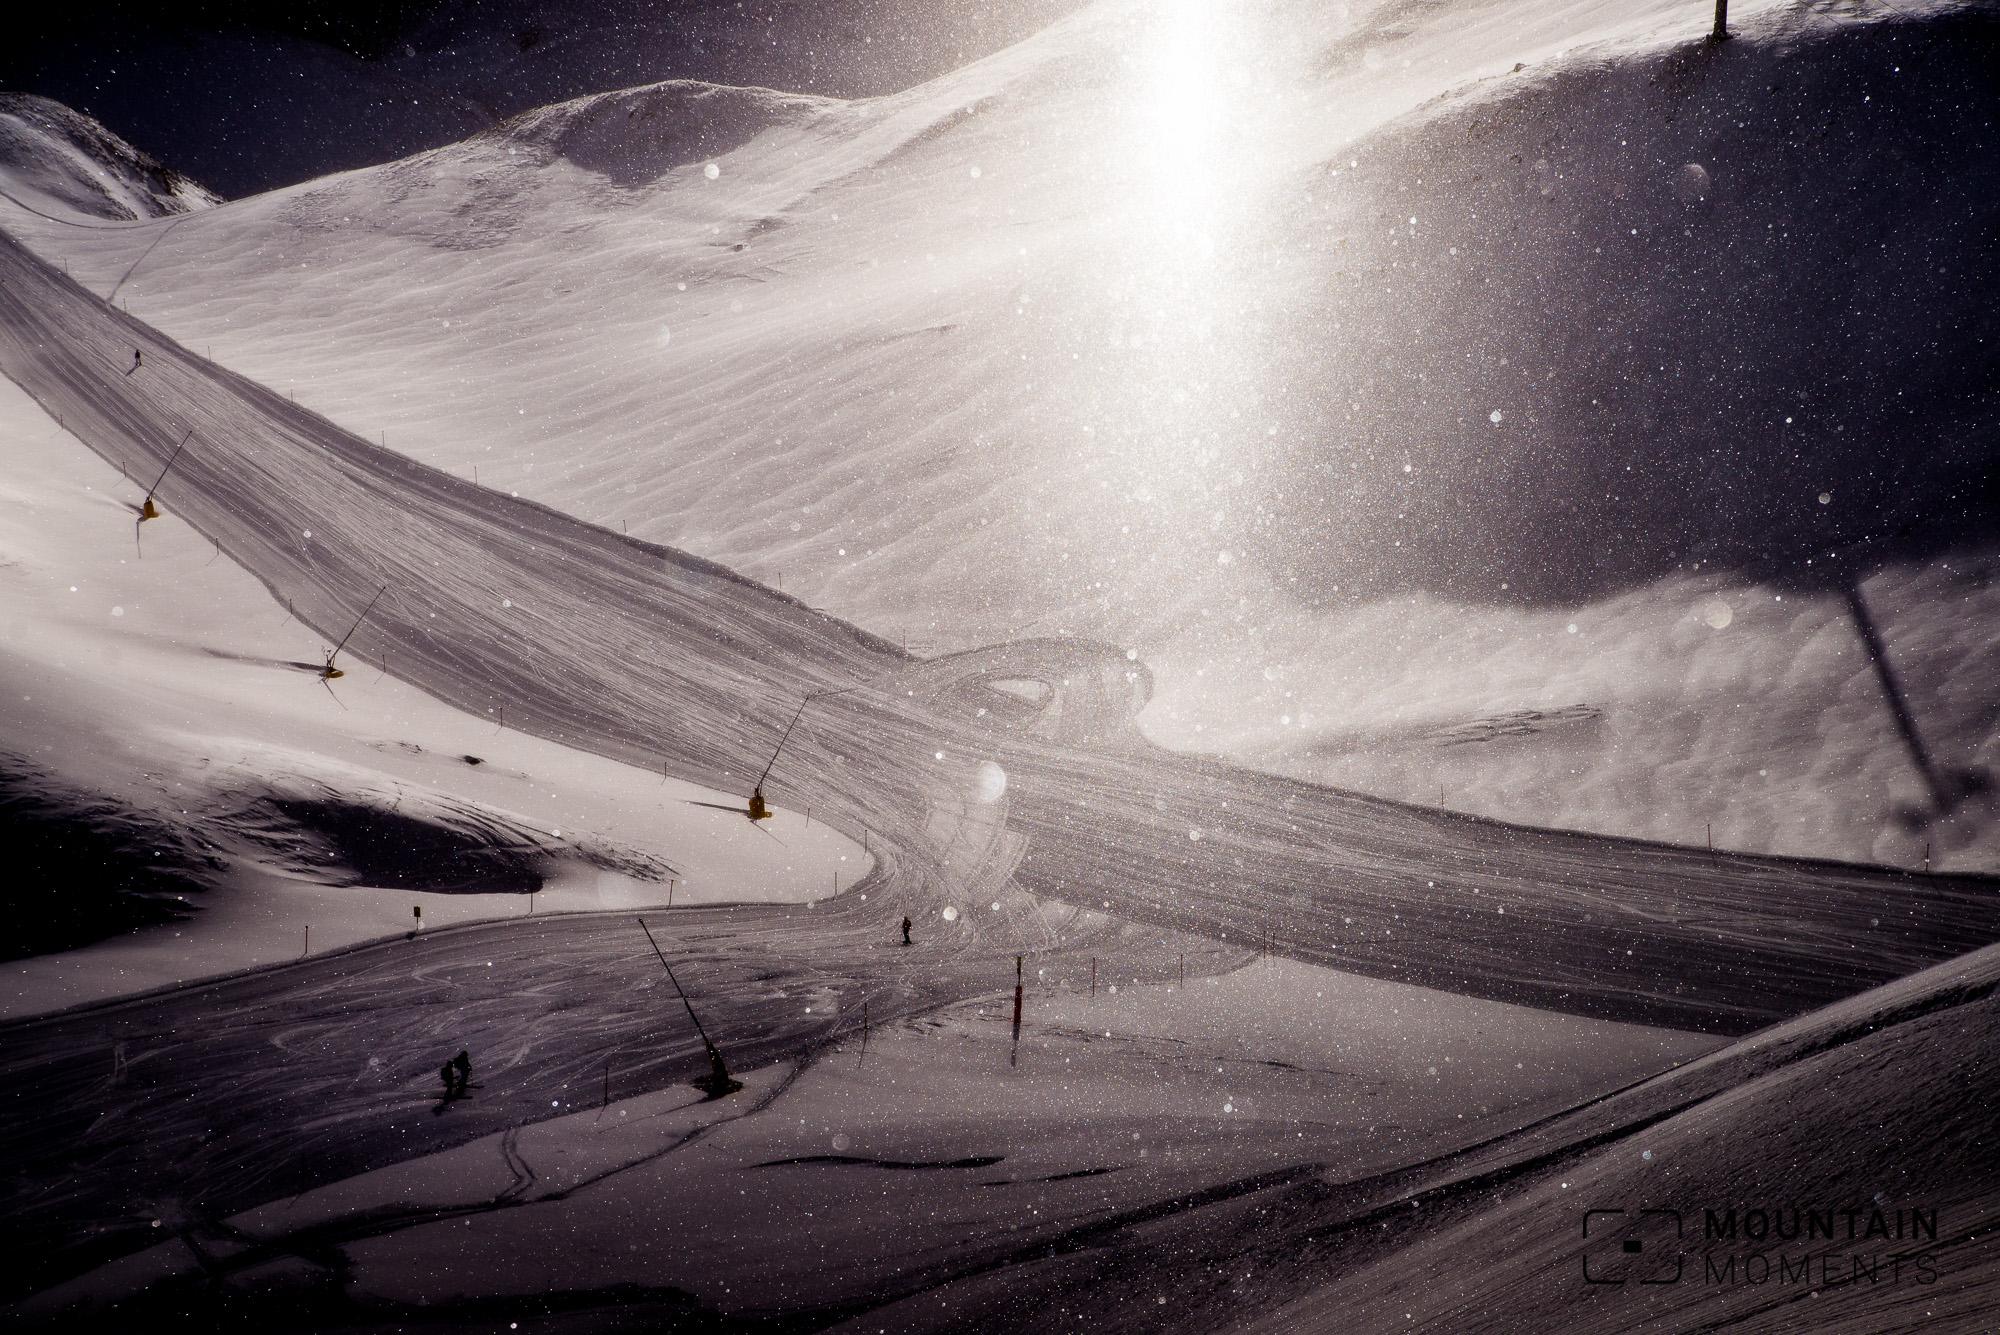 ischgl, paznaun, fotspots, mountains, berge, fotospots, fotolocations, samnaun, clouds, wolken, winterbilder, ski, freeride, skitour